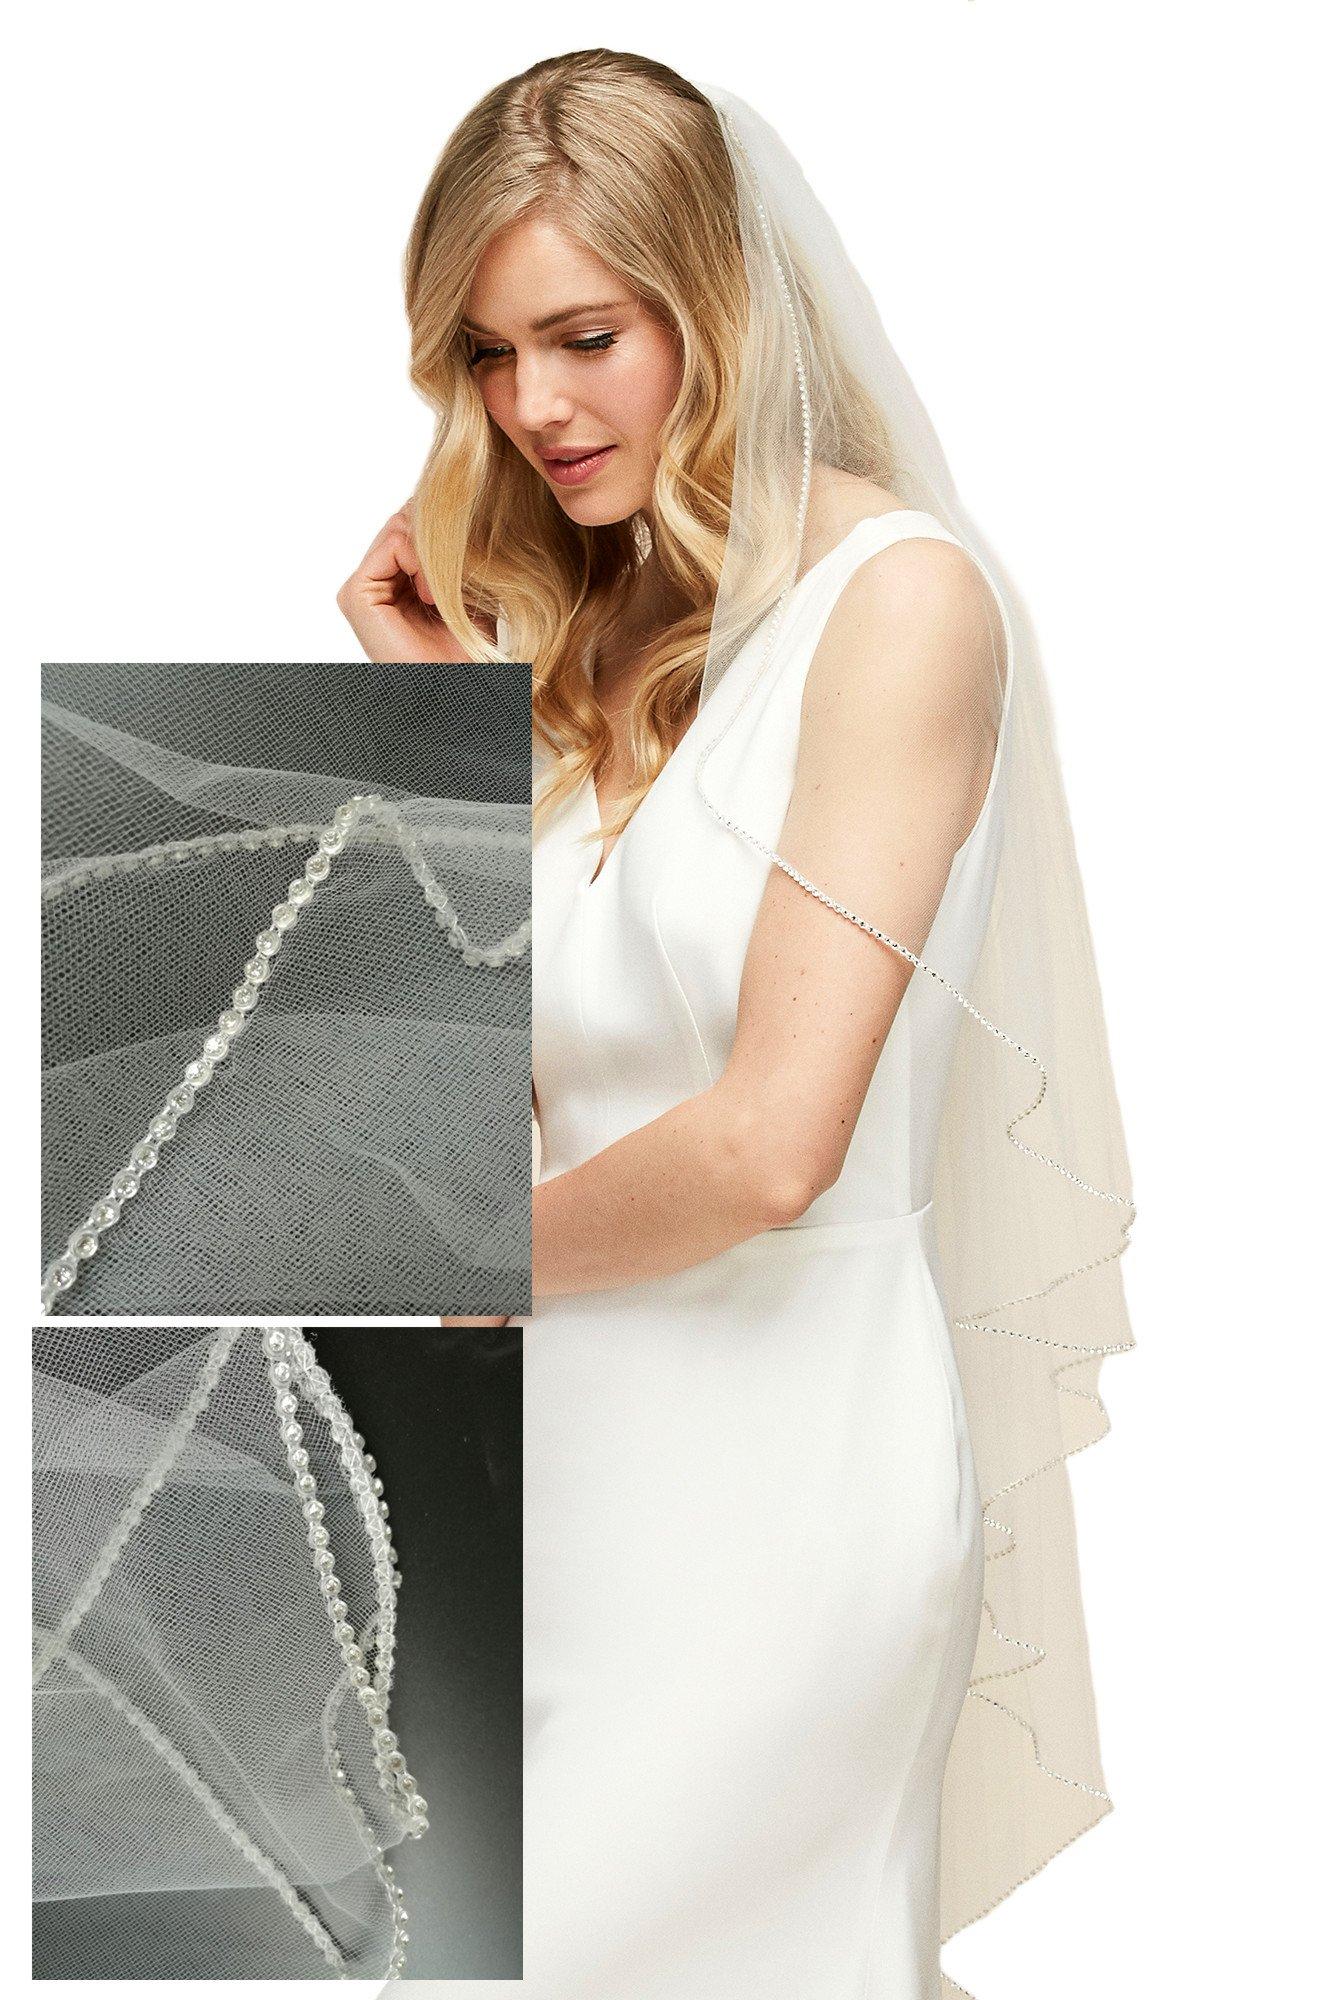 Passat Ivory 1 Tier 2M Long Long Wedding Veils Rhinestone Edge Bridal Veil 223 by Passat